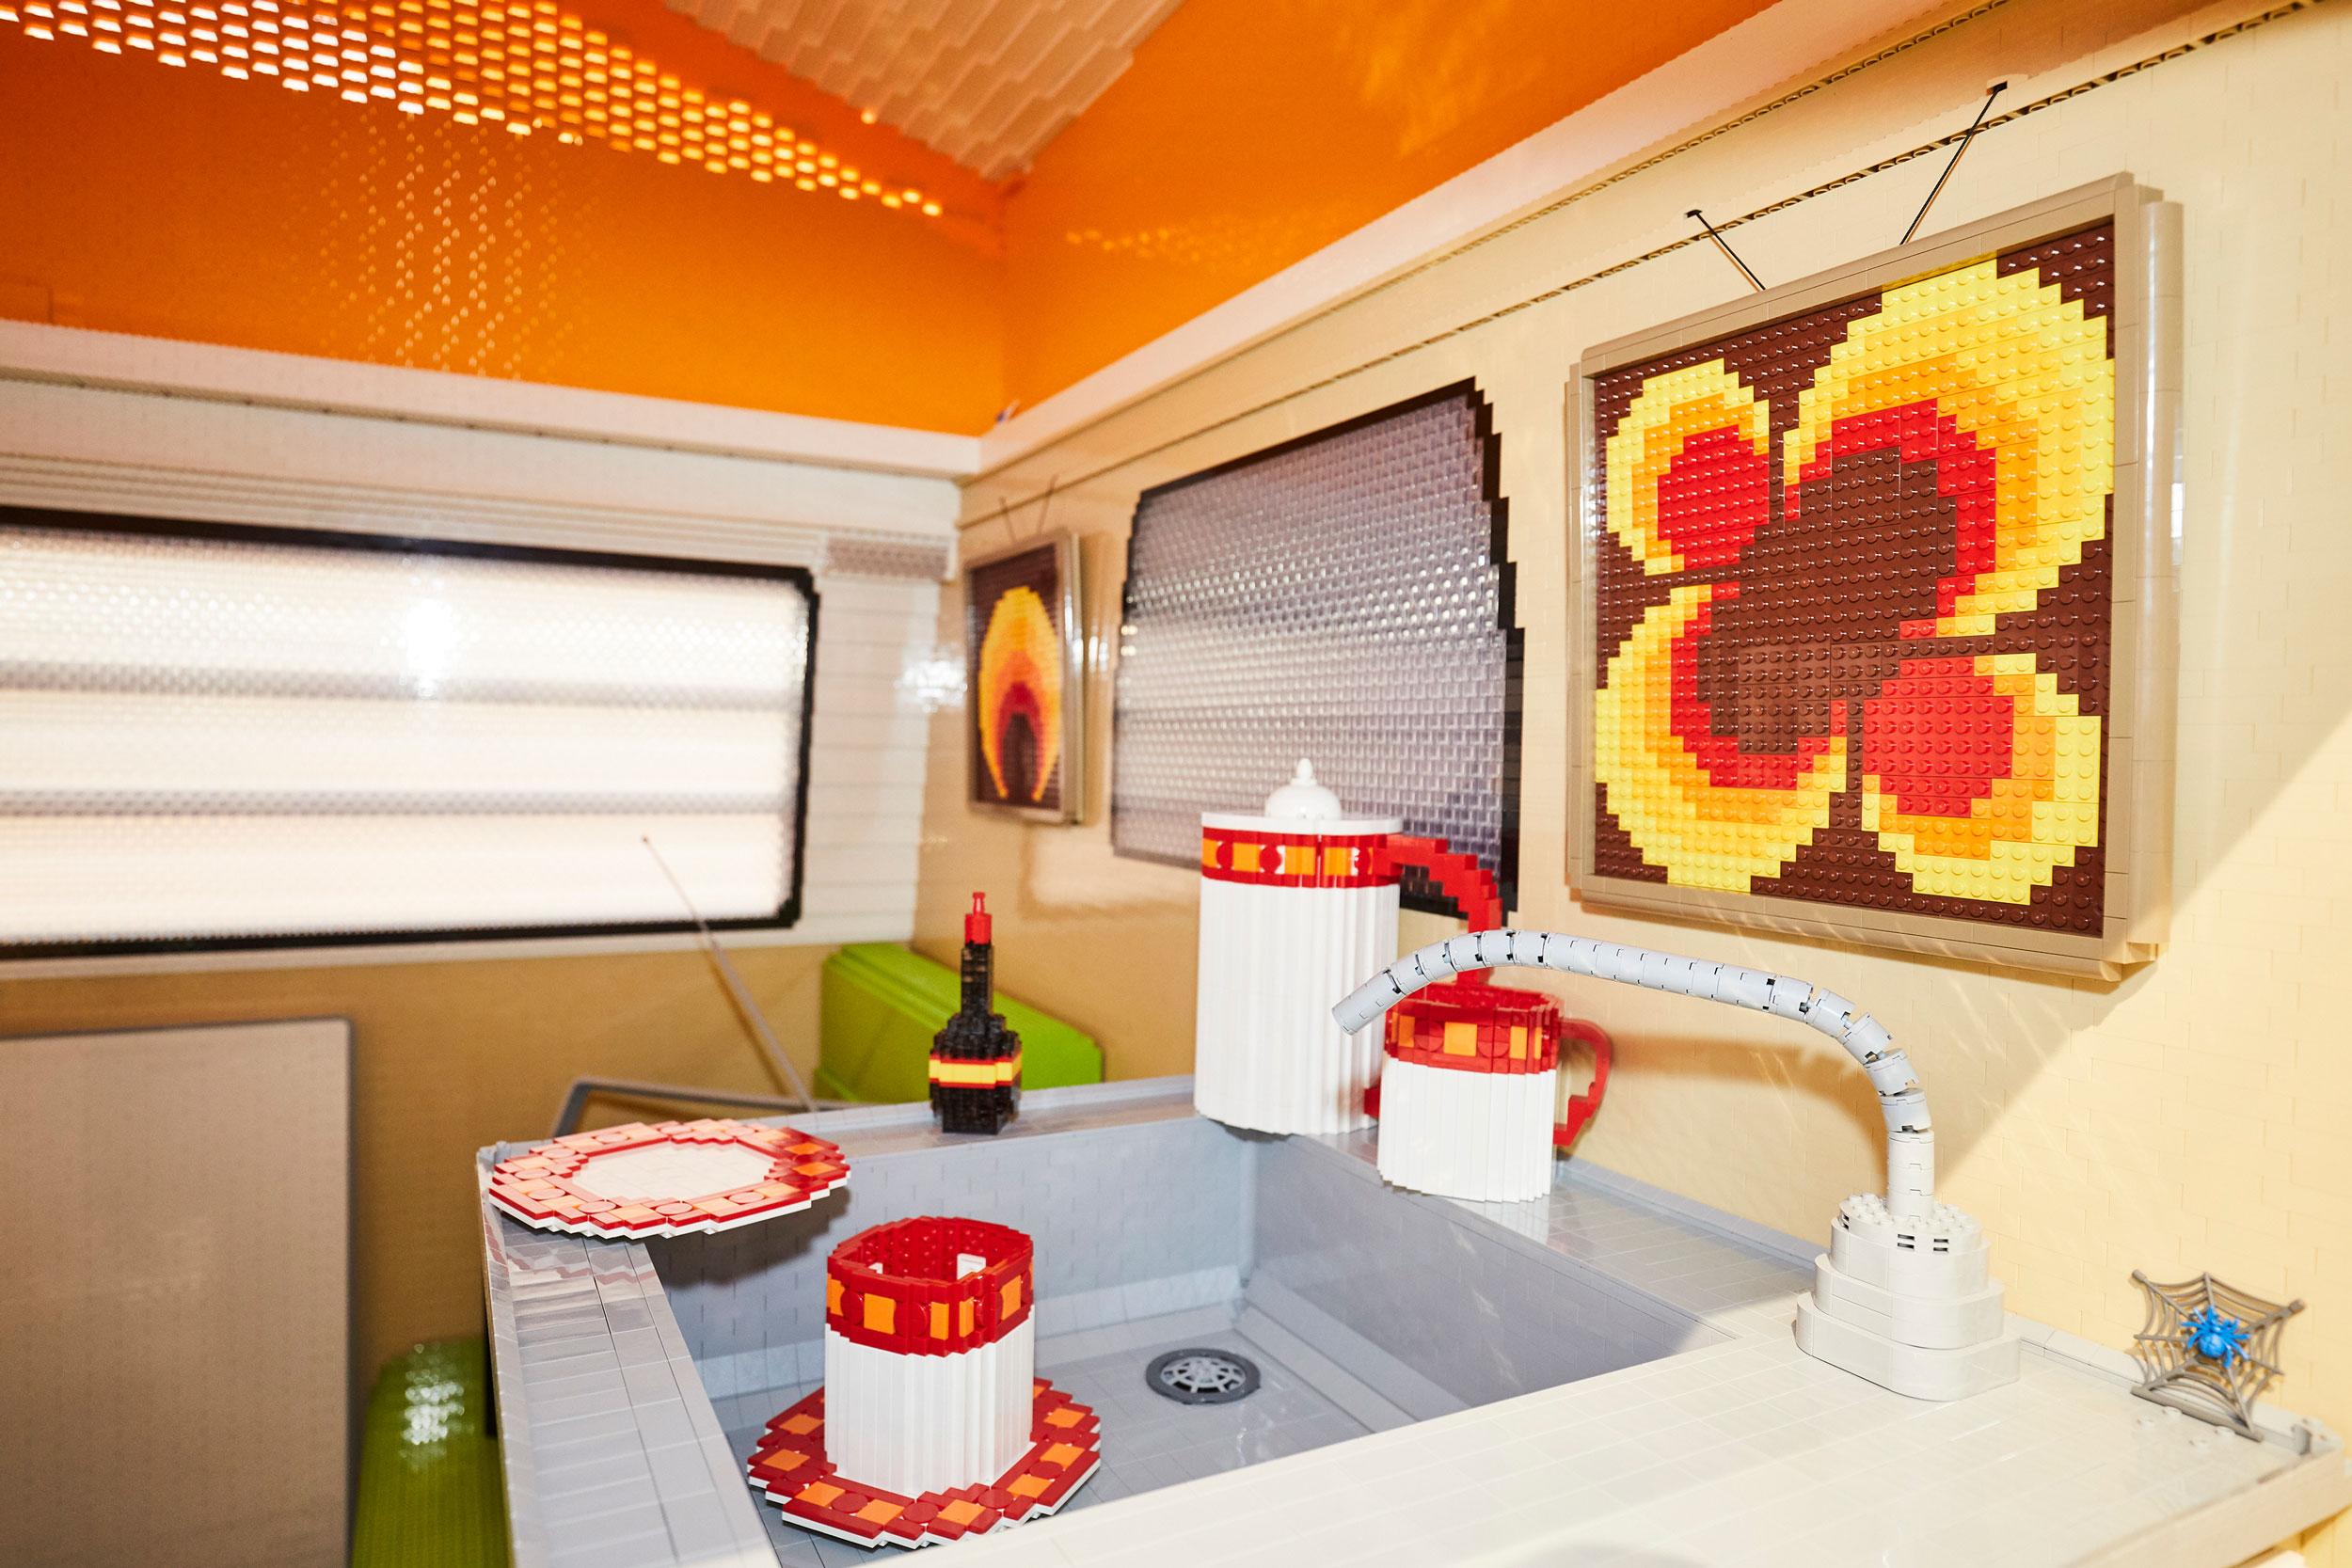 Volkswagen Type 2 created from 400,000 LEGO bricks interior paintings